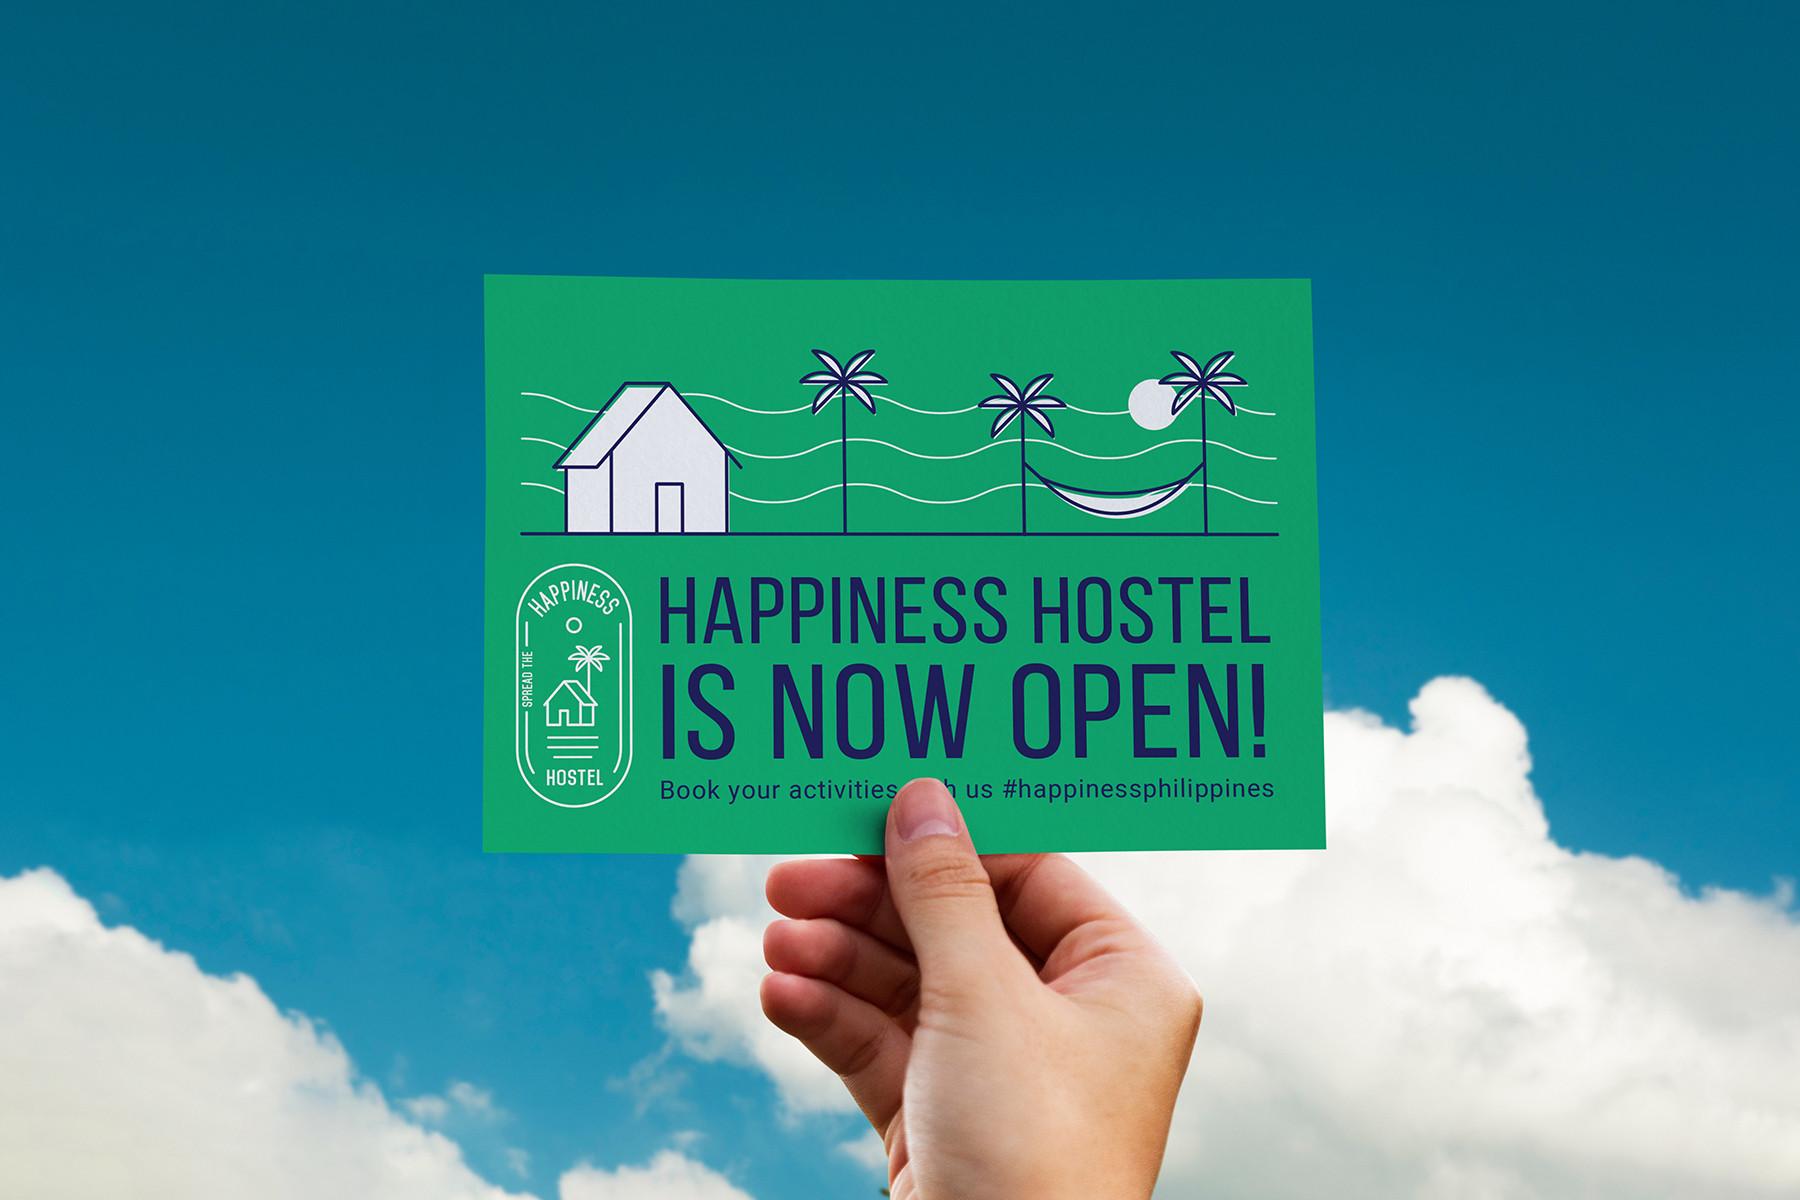 happiness_postcard.jpg